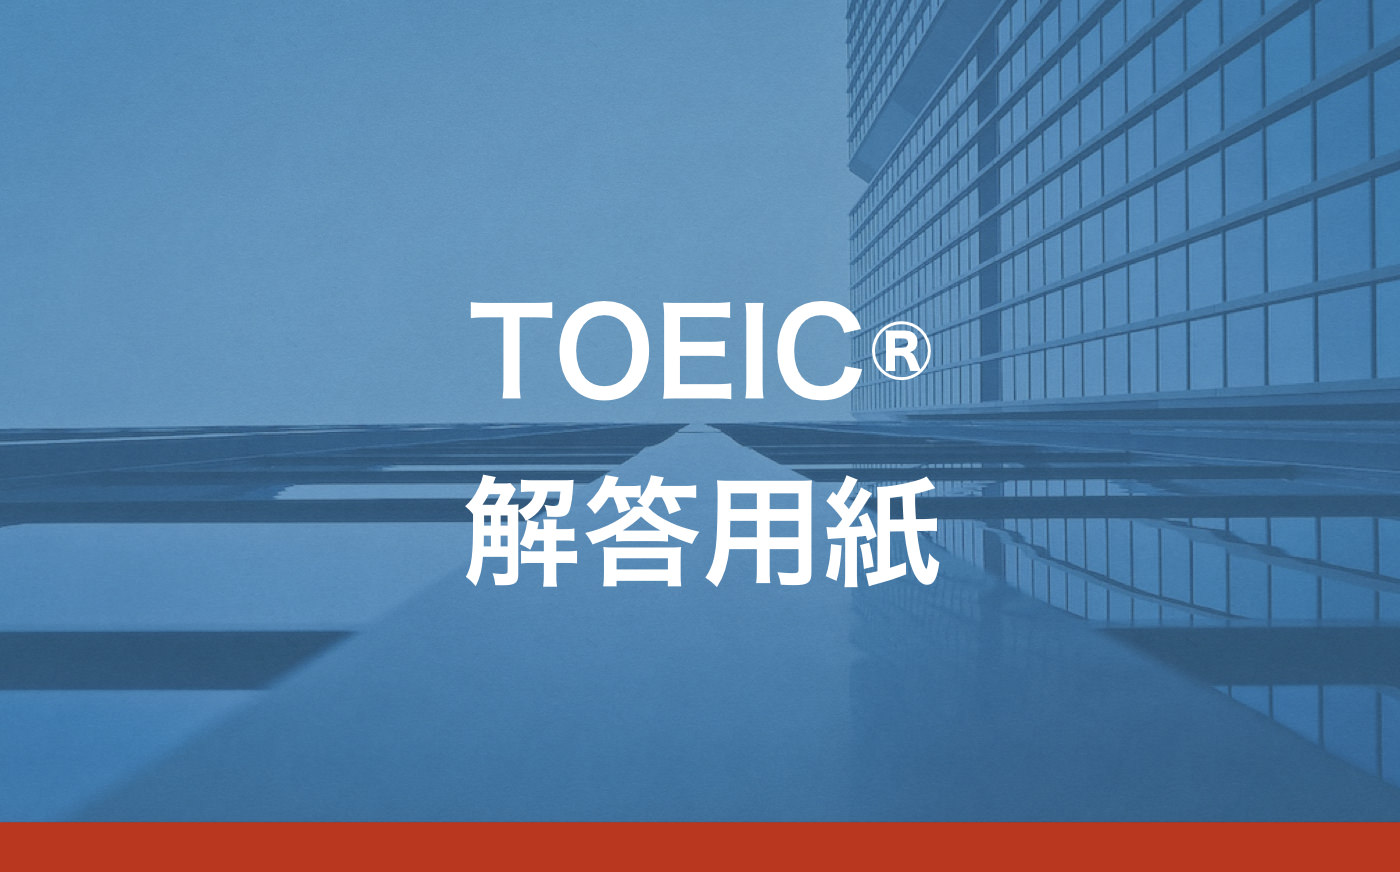 toeic 文法 pdf